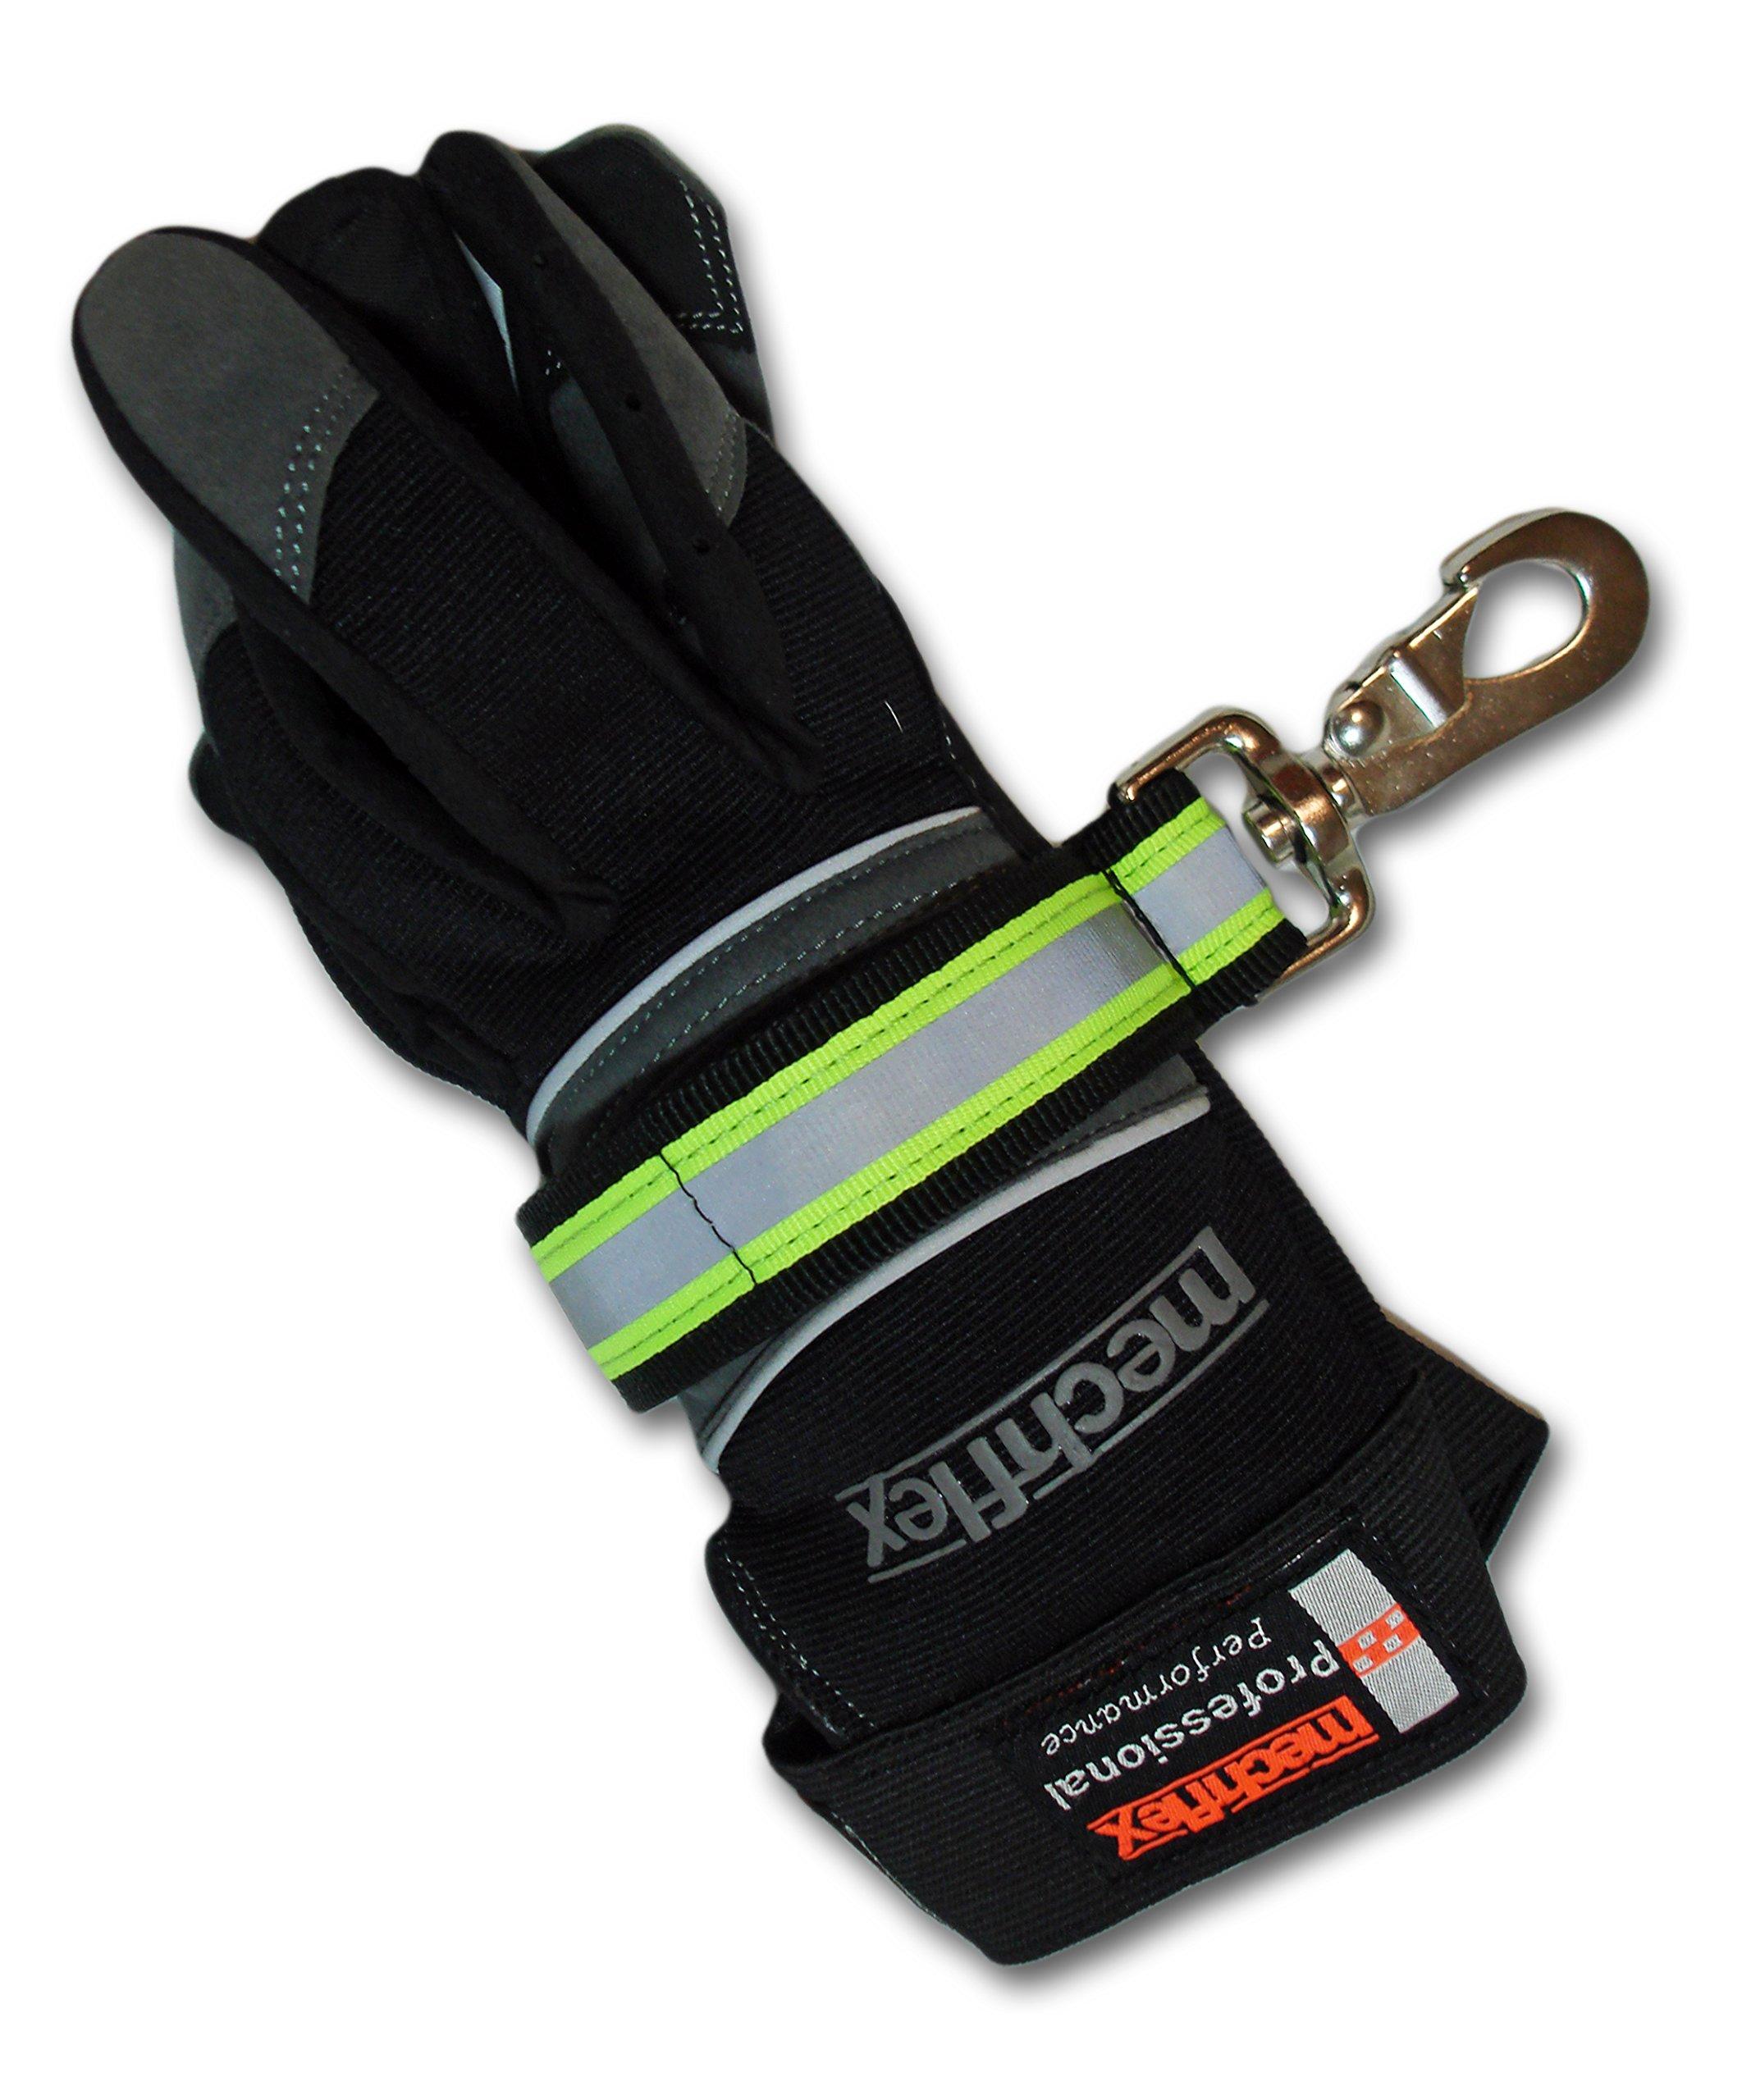 Lightning X Reflective Firefighter Rescue Extrication Glove Strap Alligator Clip